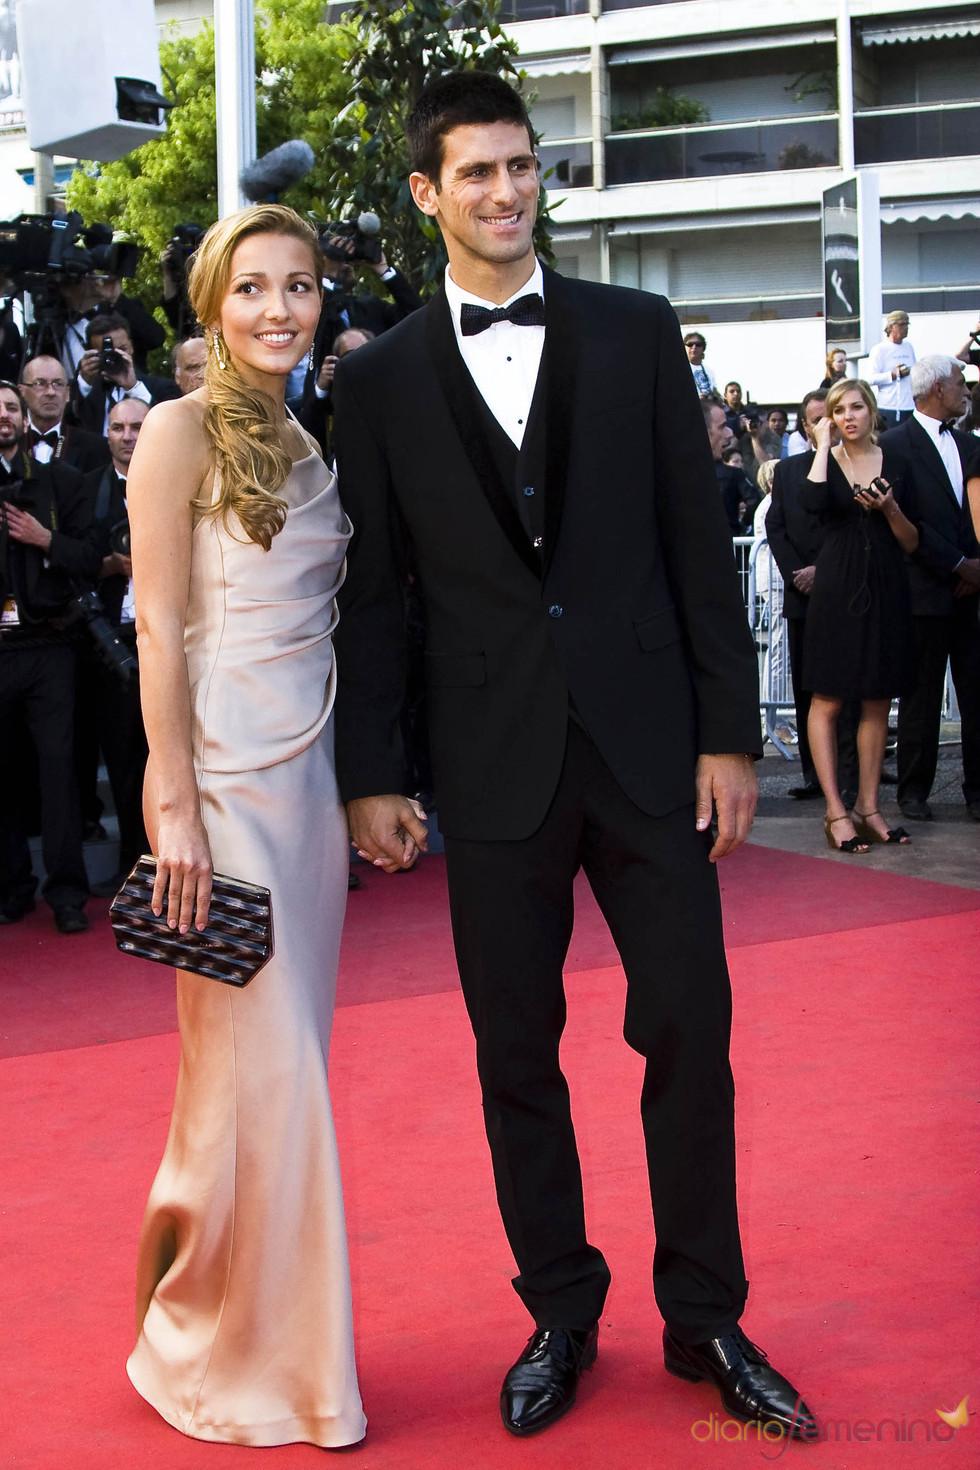 Jelena Ristic, novia de Djokovic